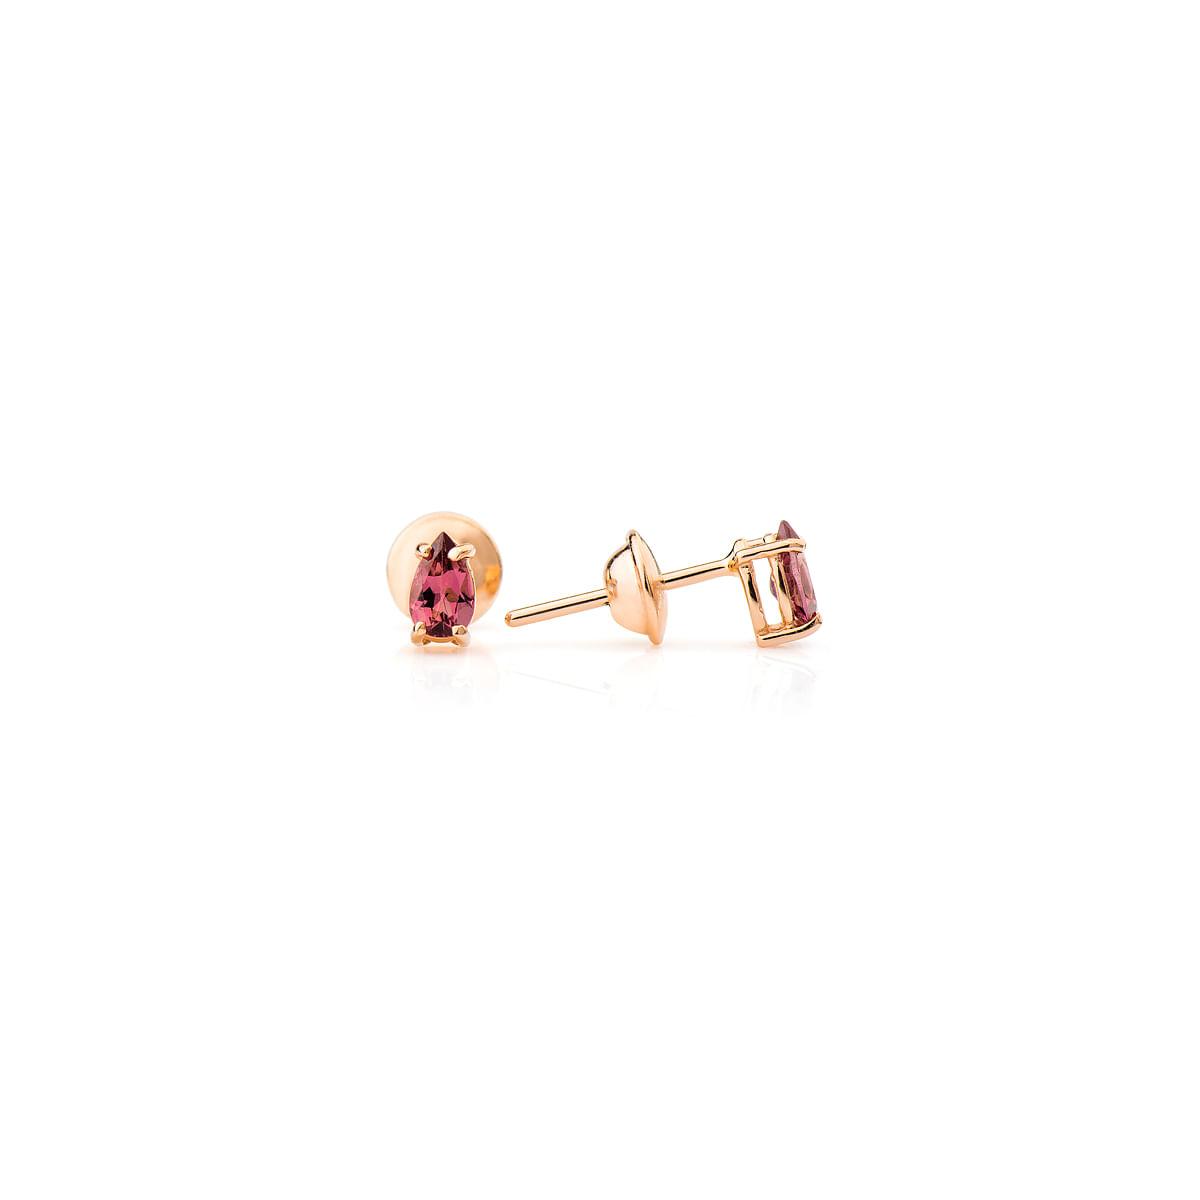 Brinco Ouro Rosê 18k Turmalina Rosa br21717